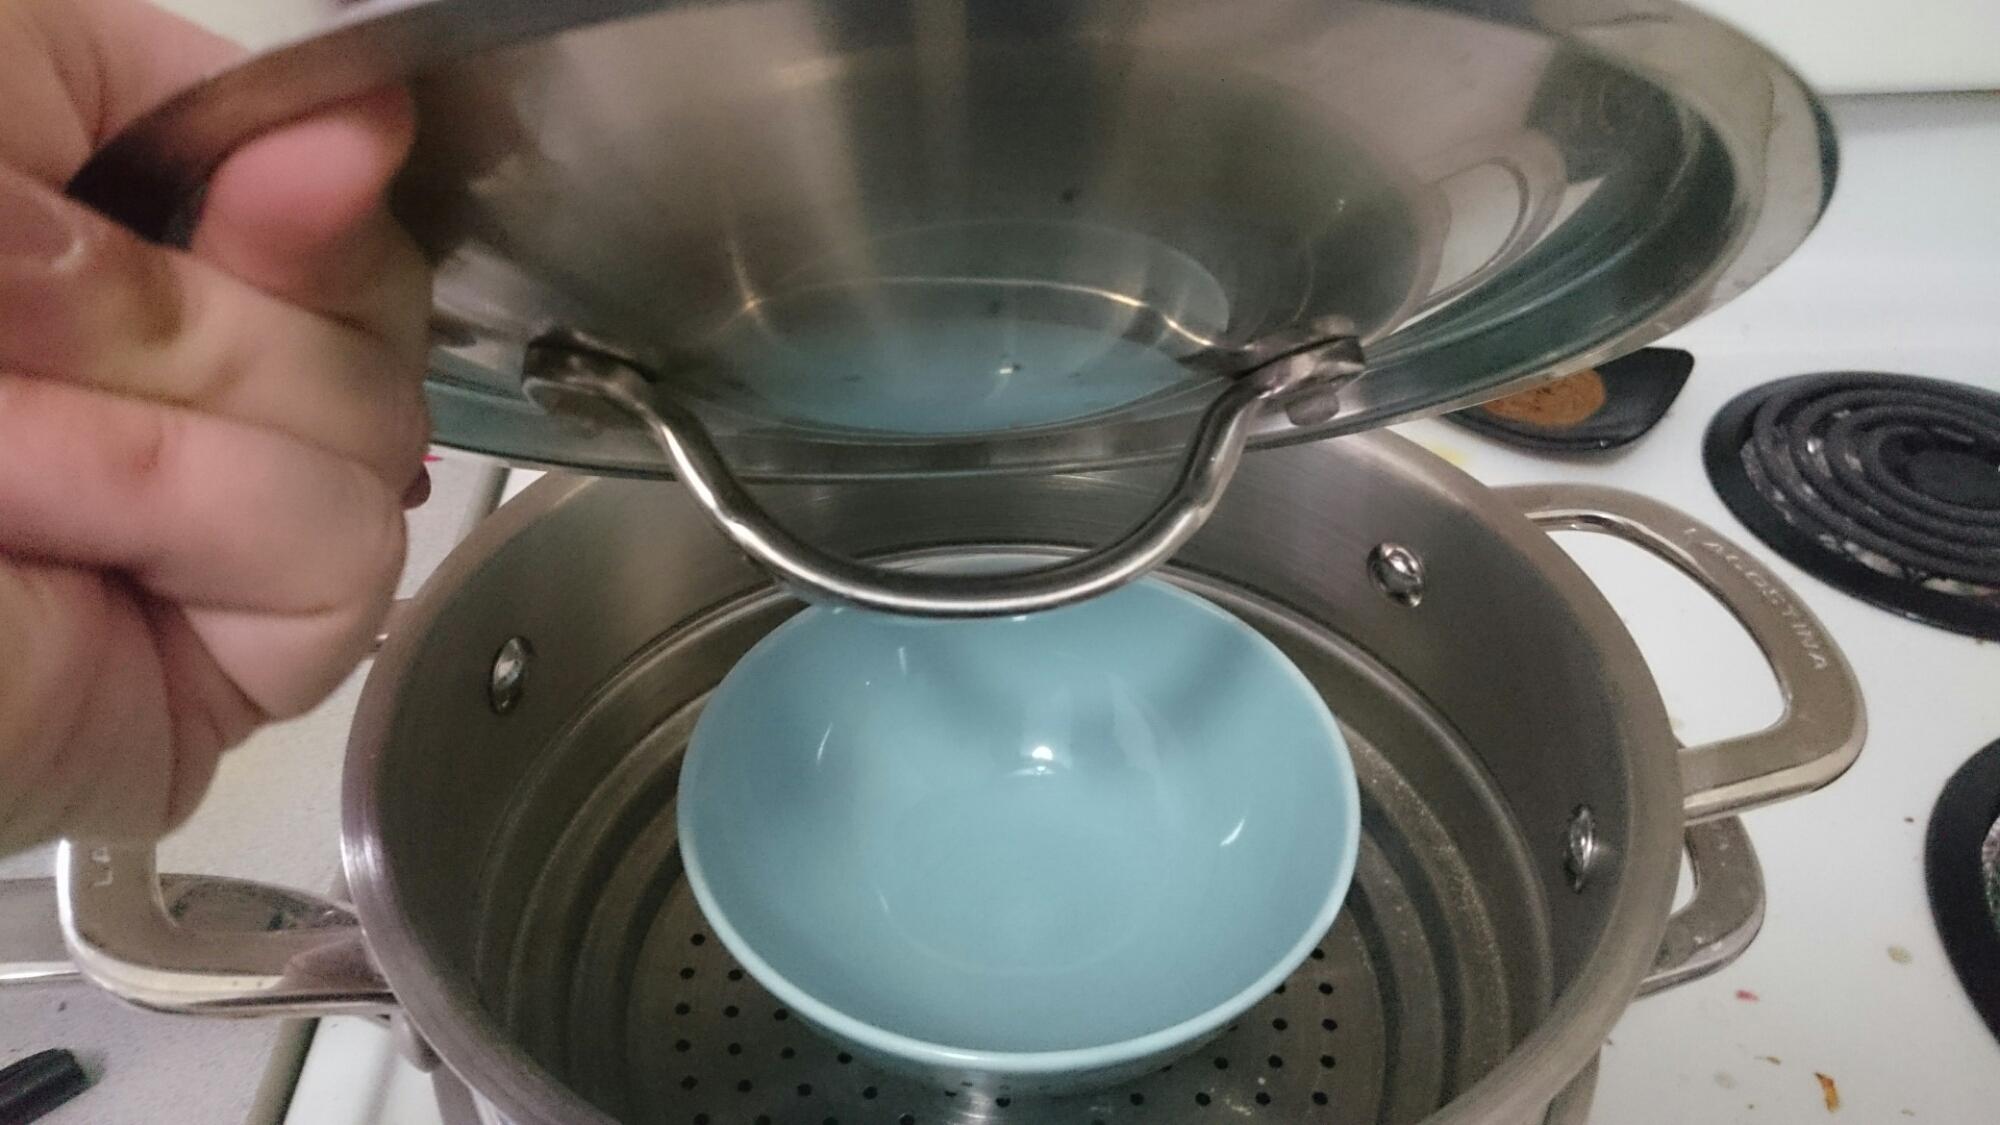 A Baker's Peel Vert